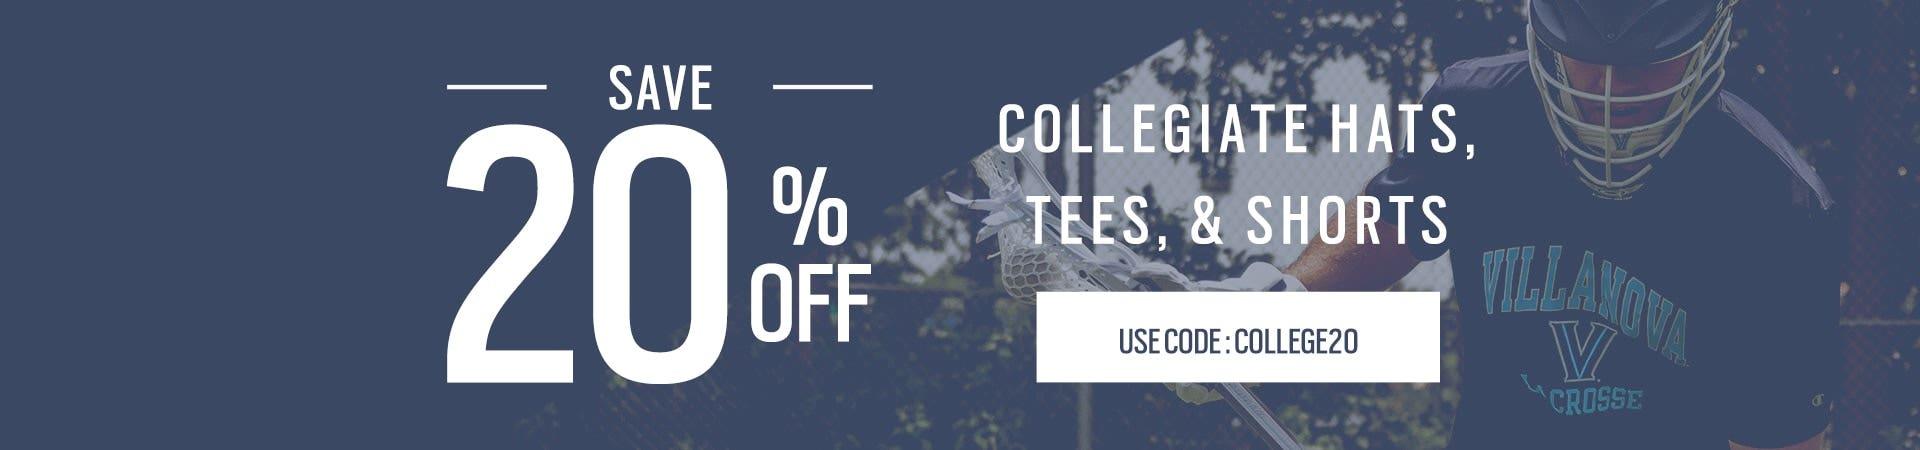 20% Off Full Price College Apparel